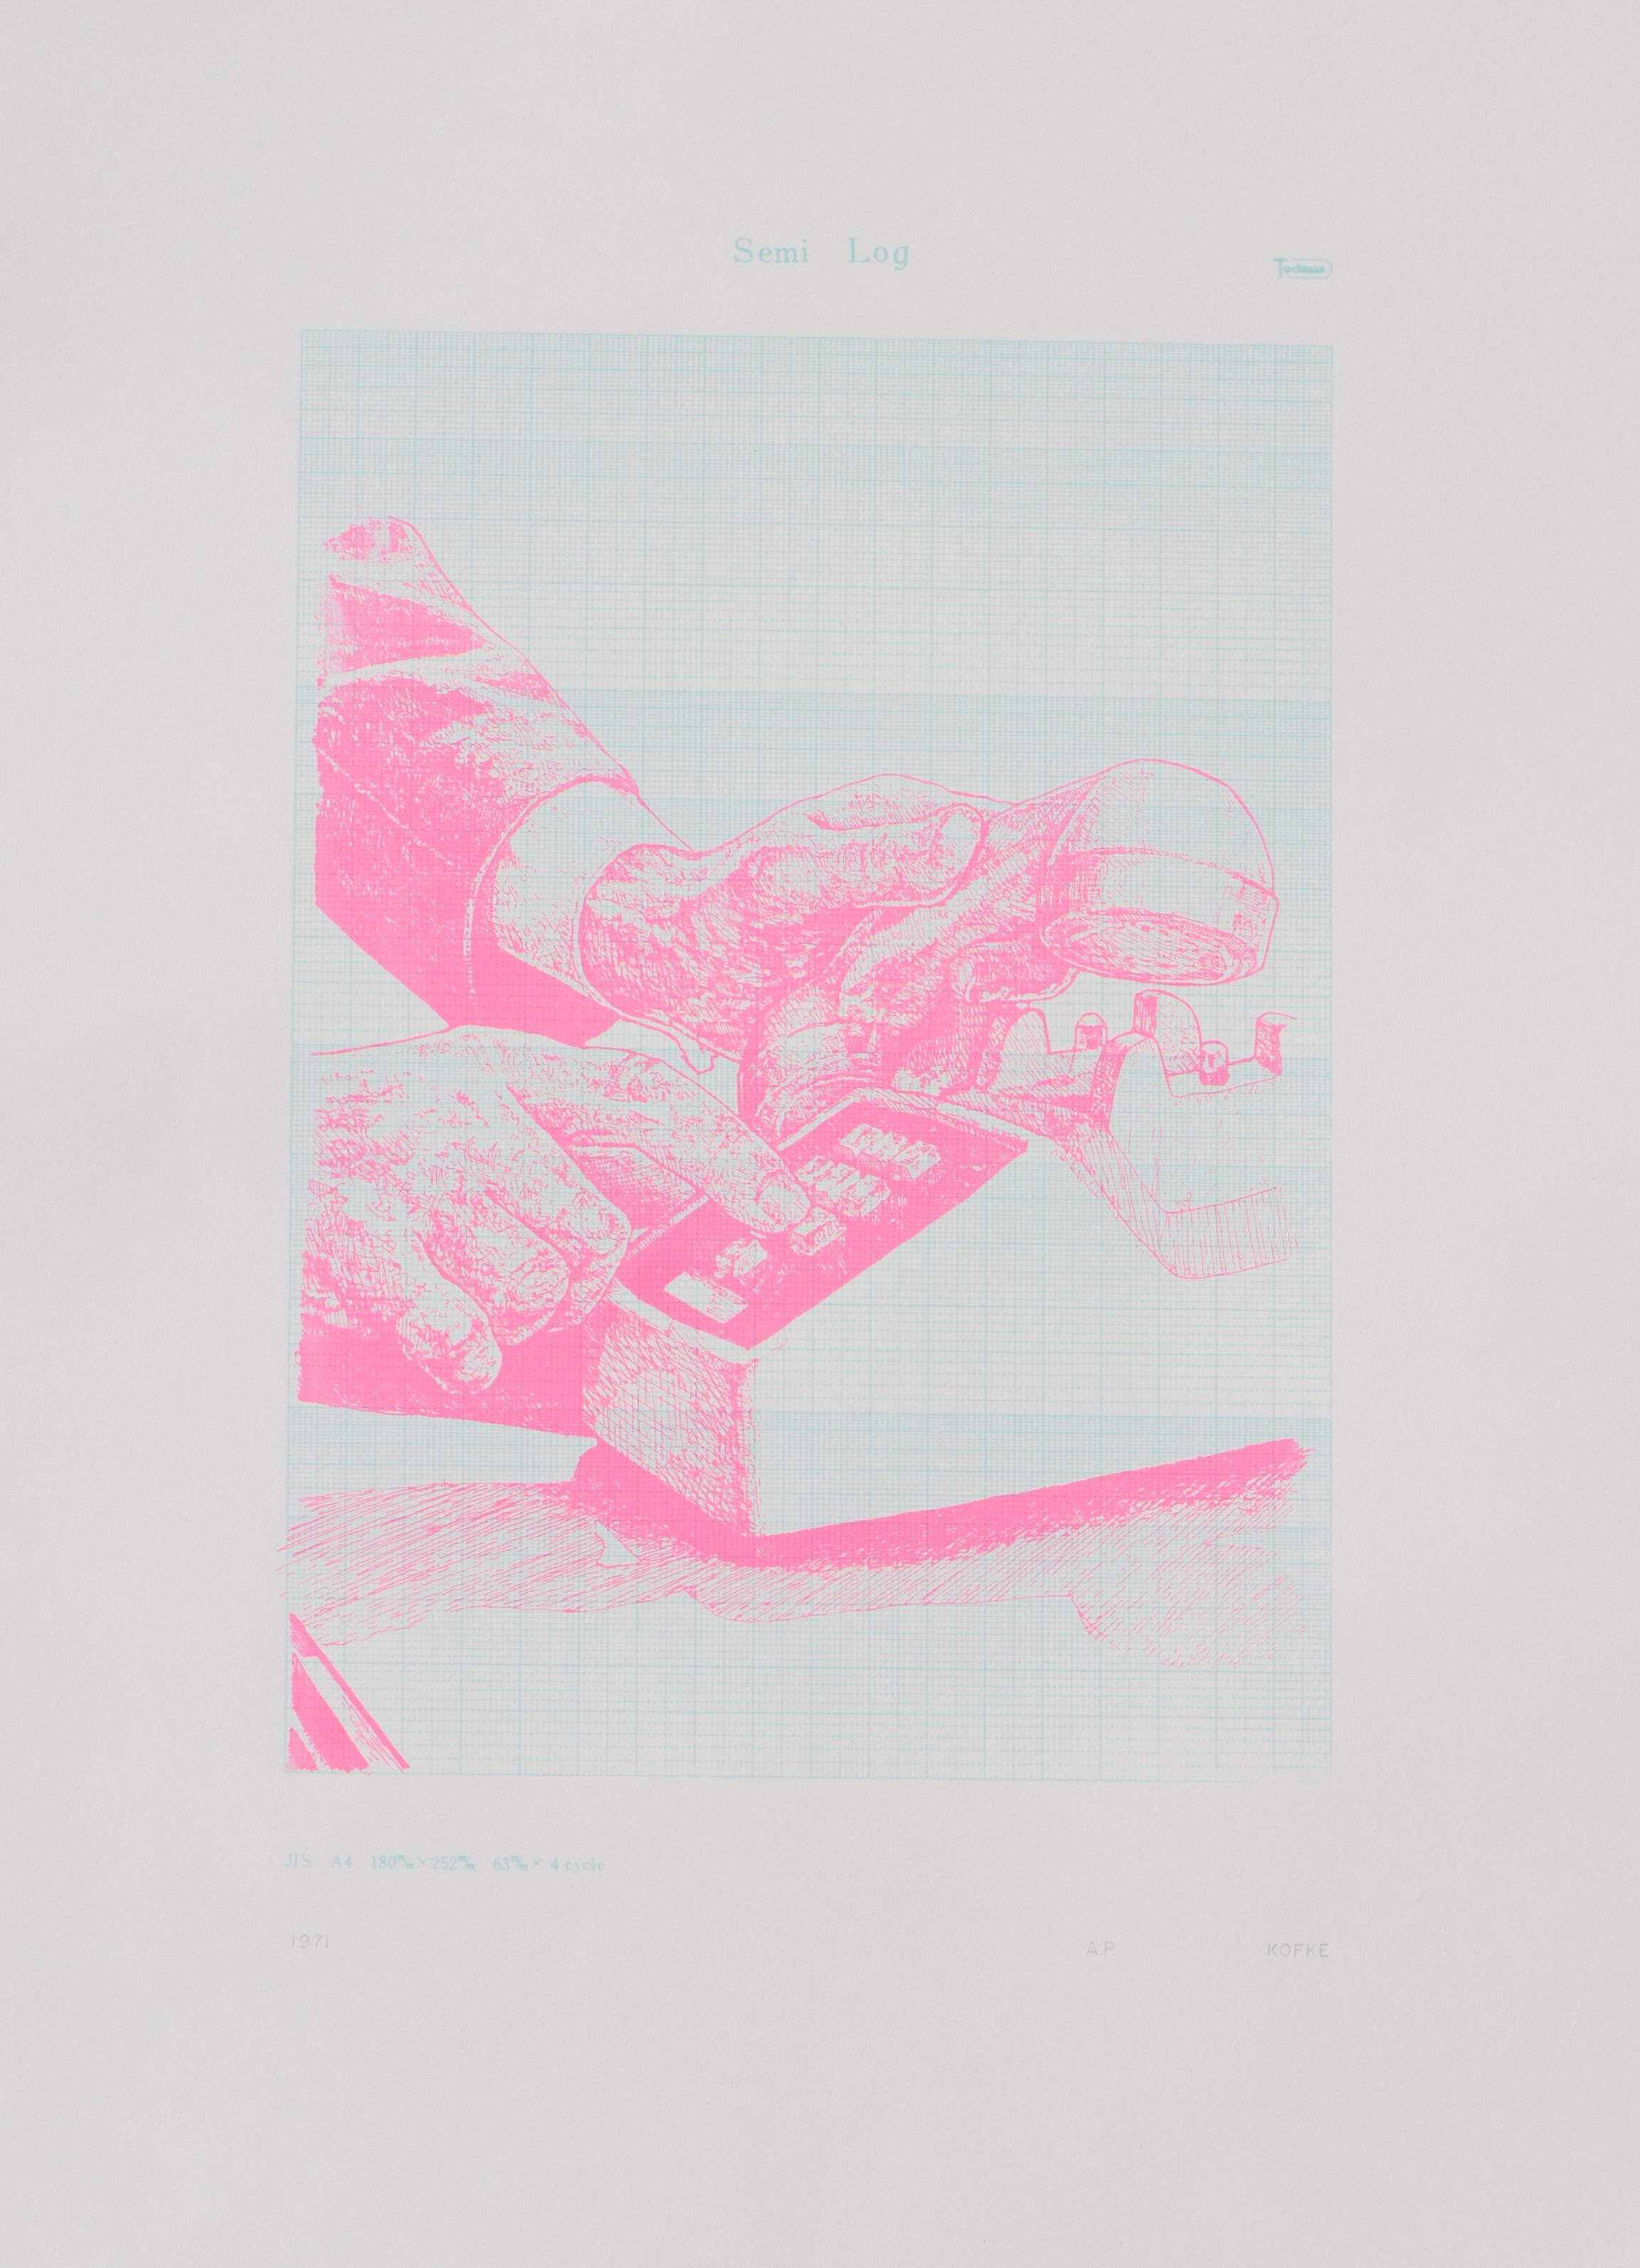 1971 screenprint on paper 35 x 25 inches JKO 095G